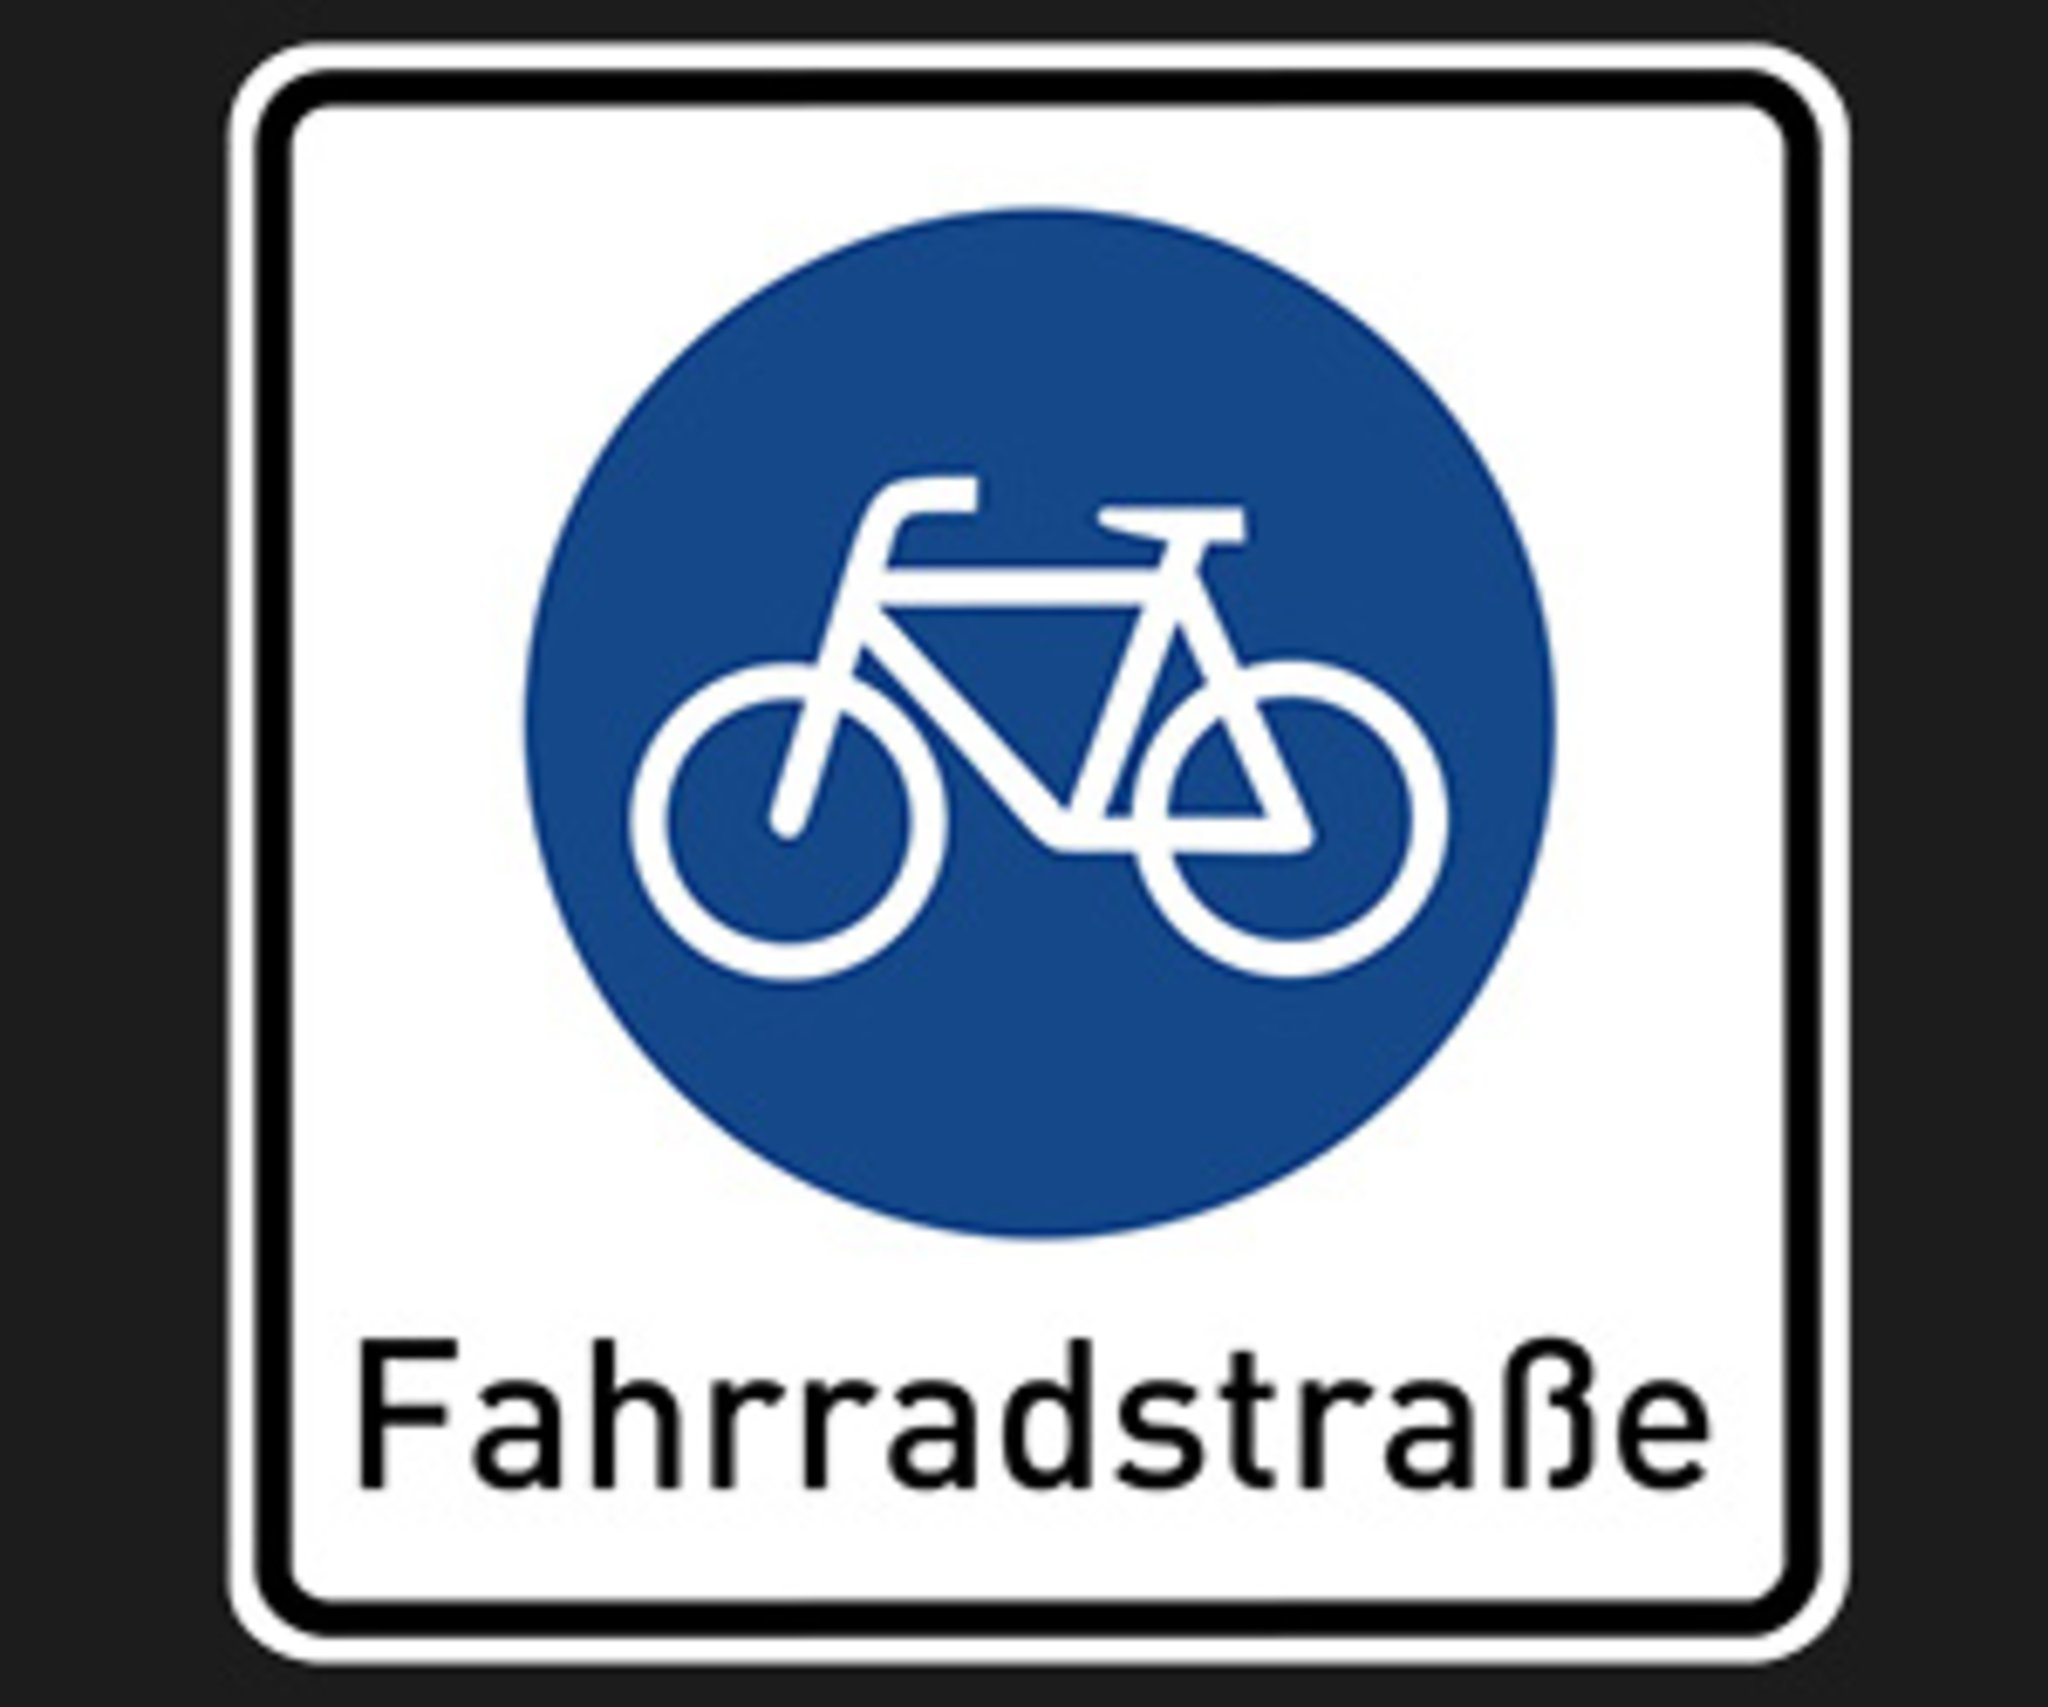 Fahrradstraße Regeln